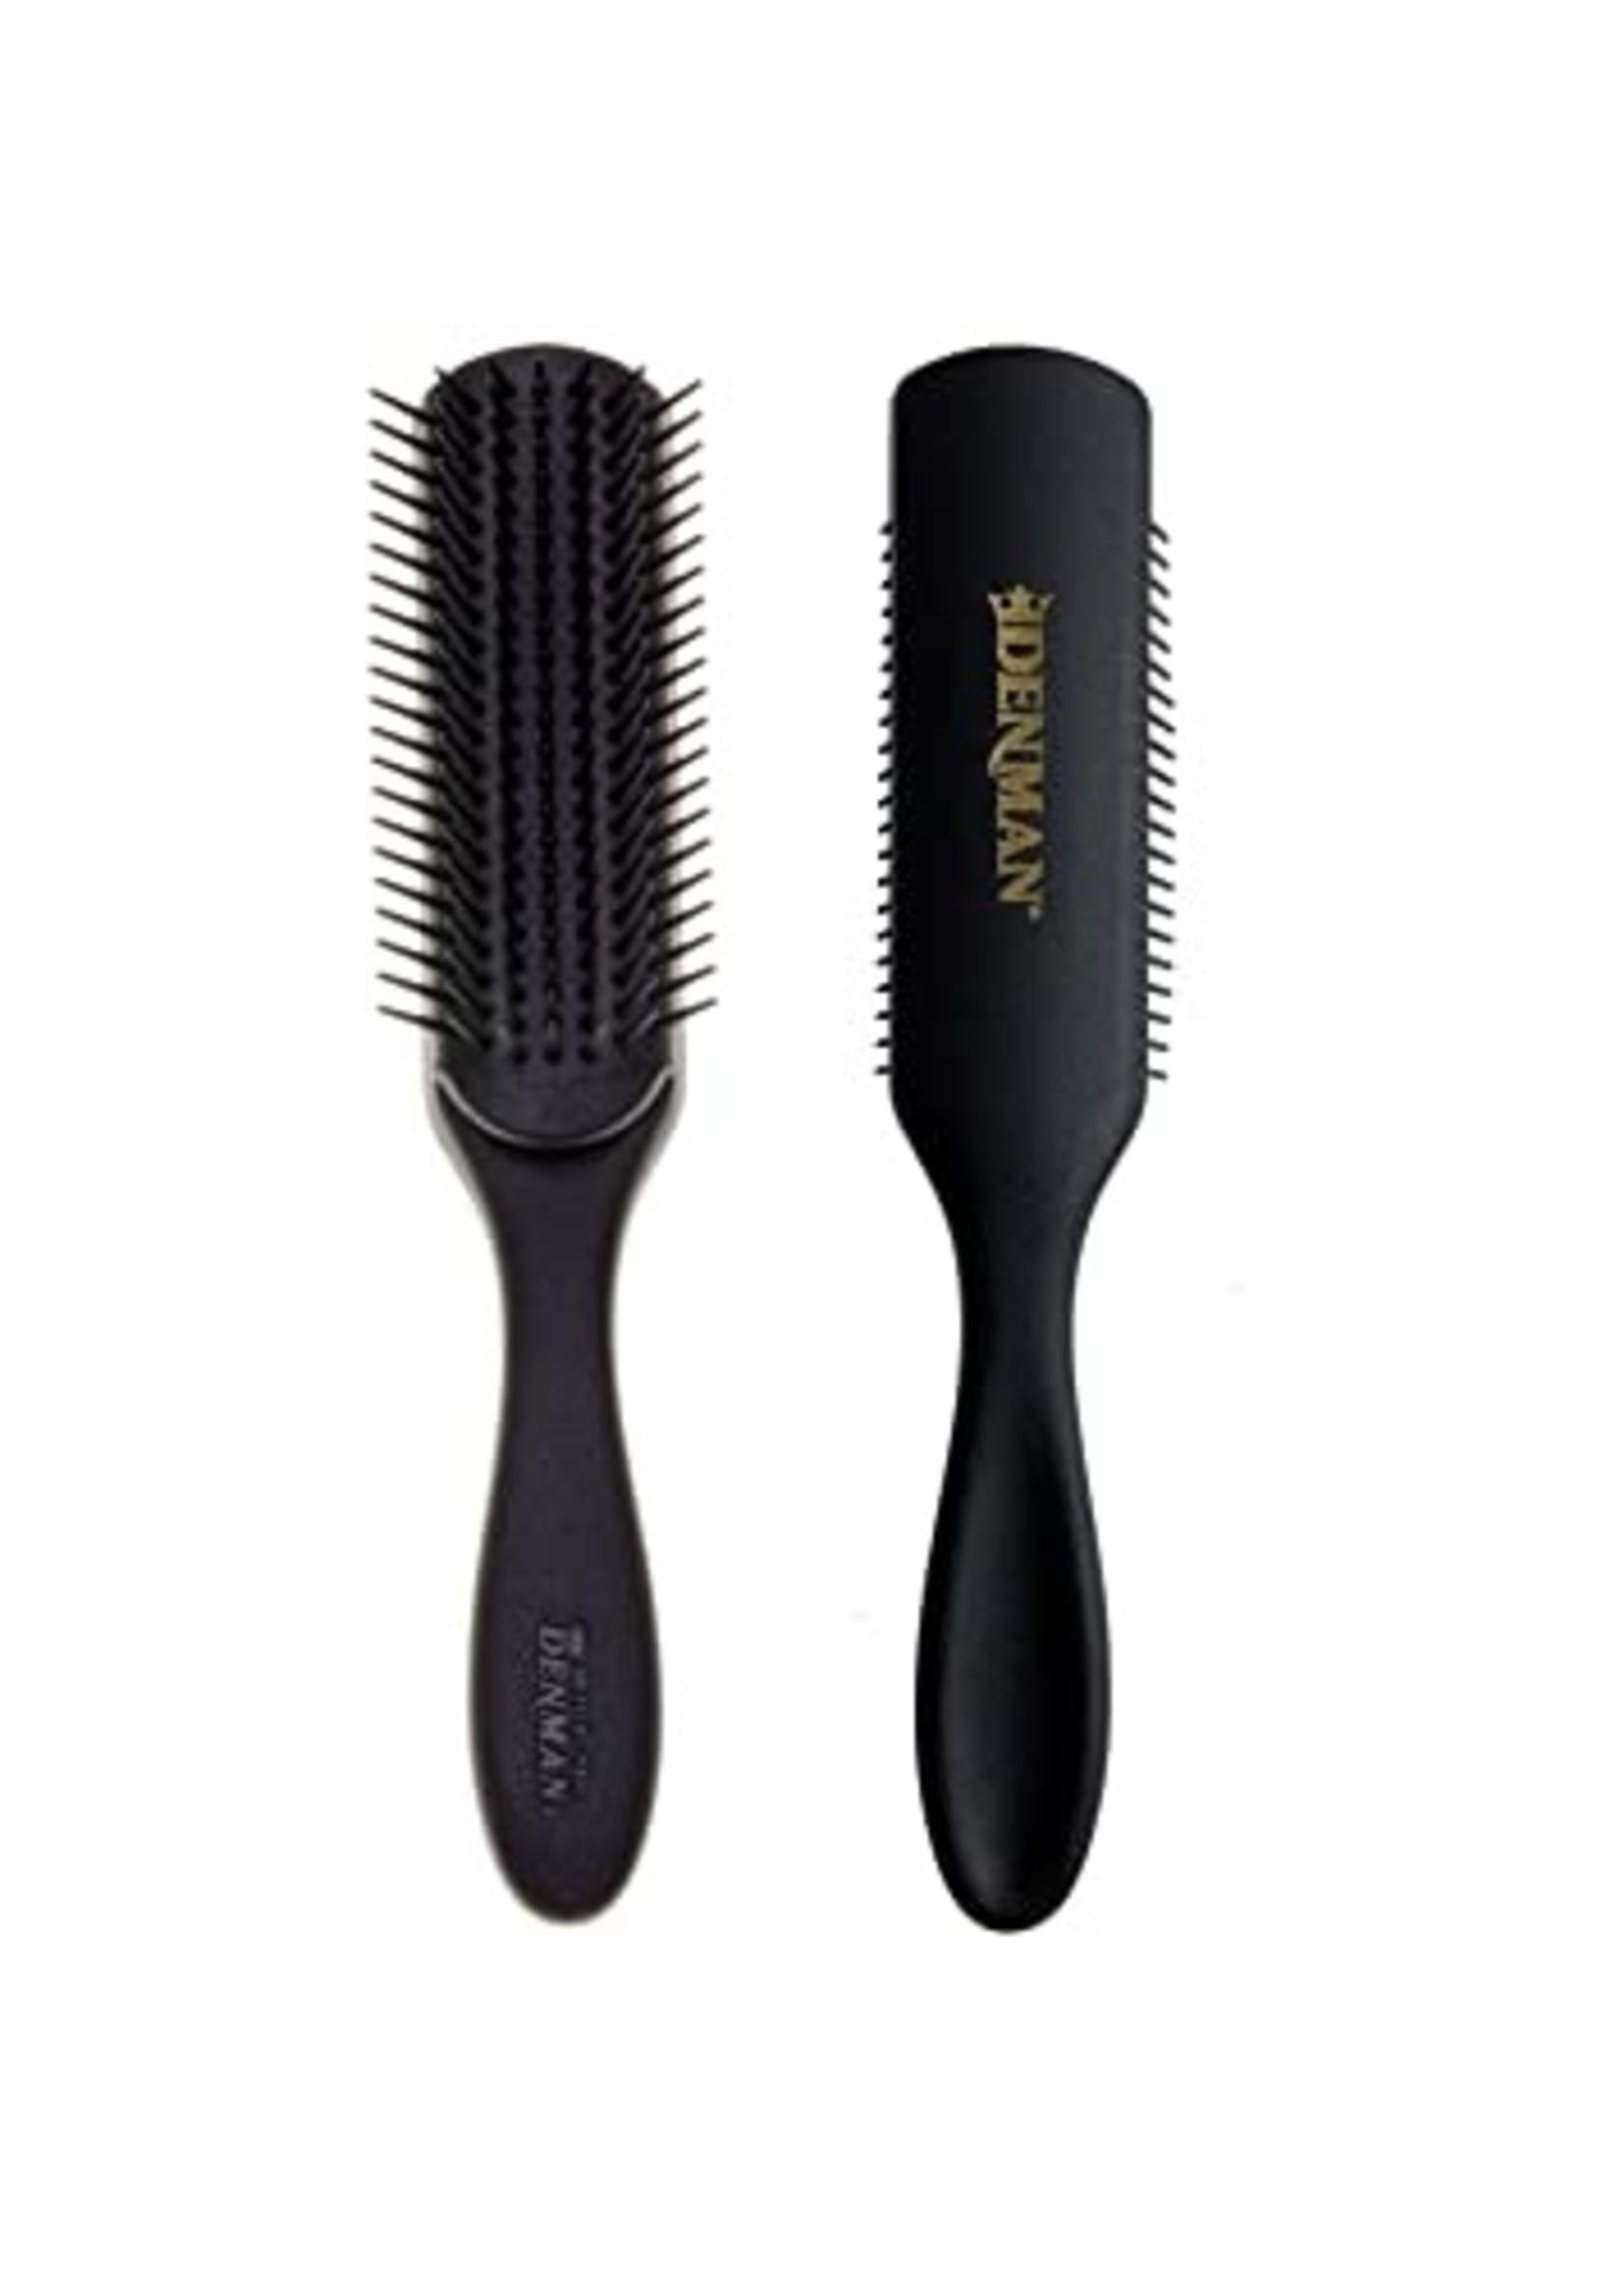 Denman Original Styler Brush